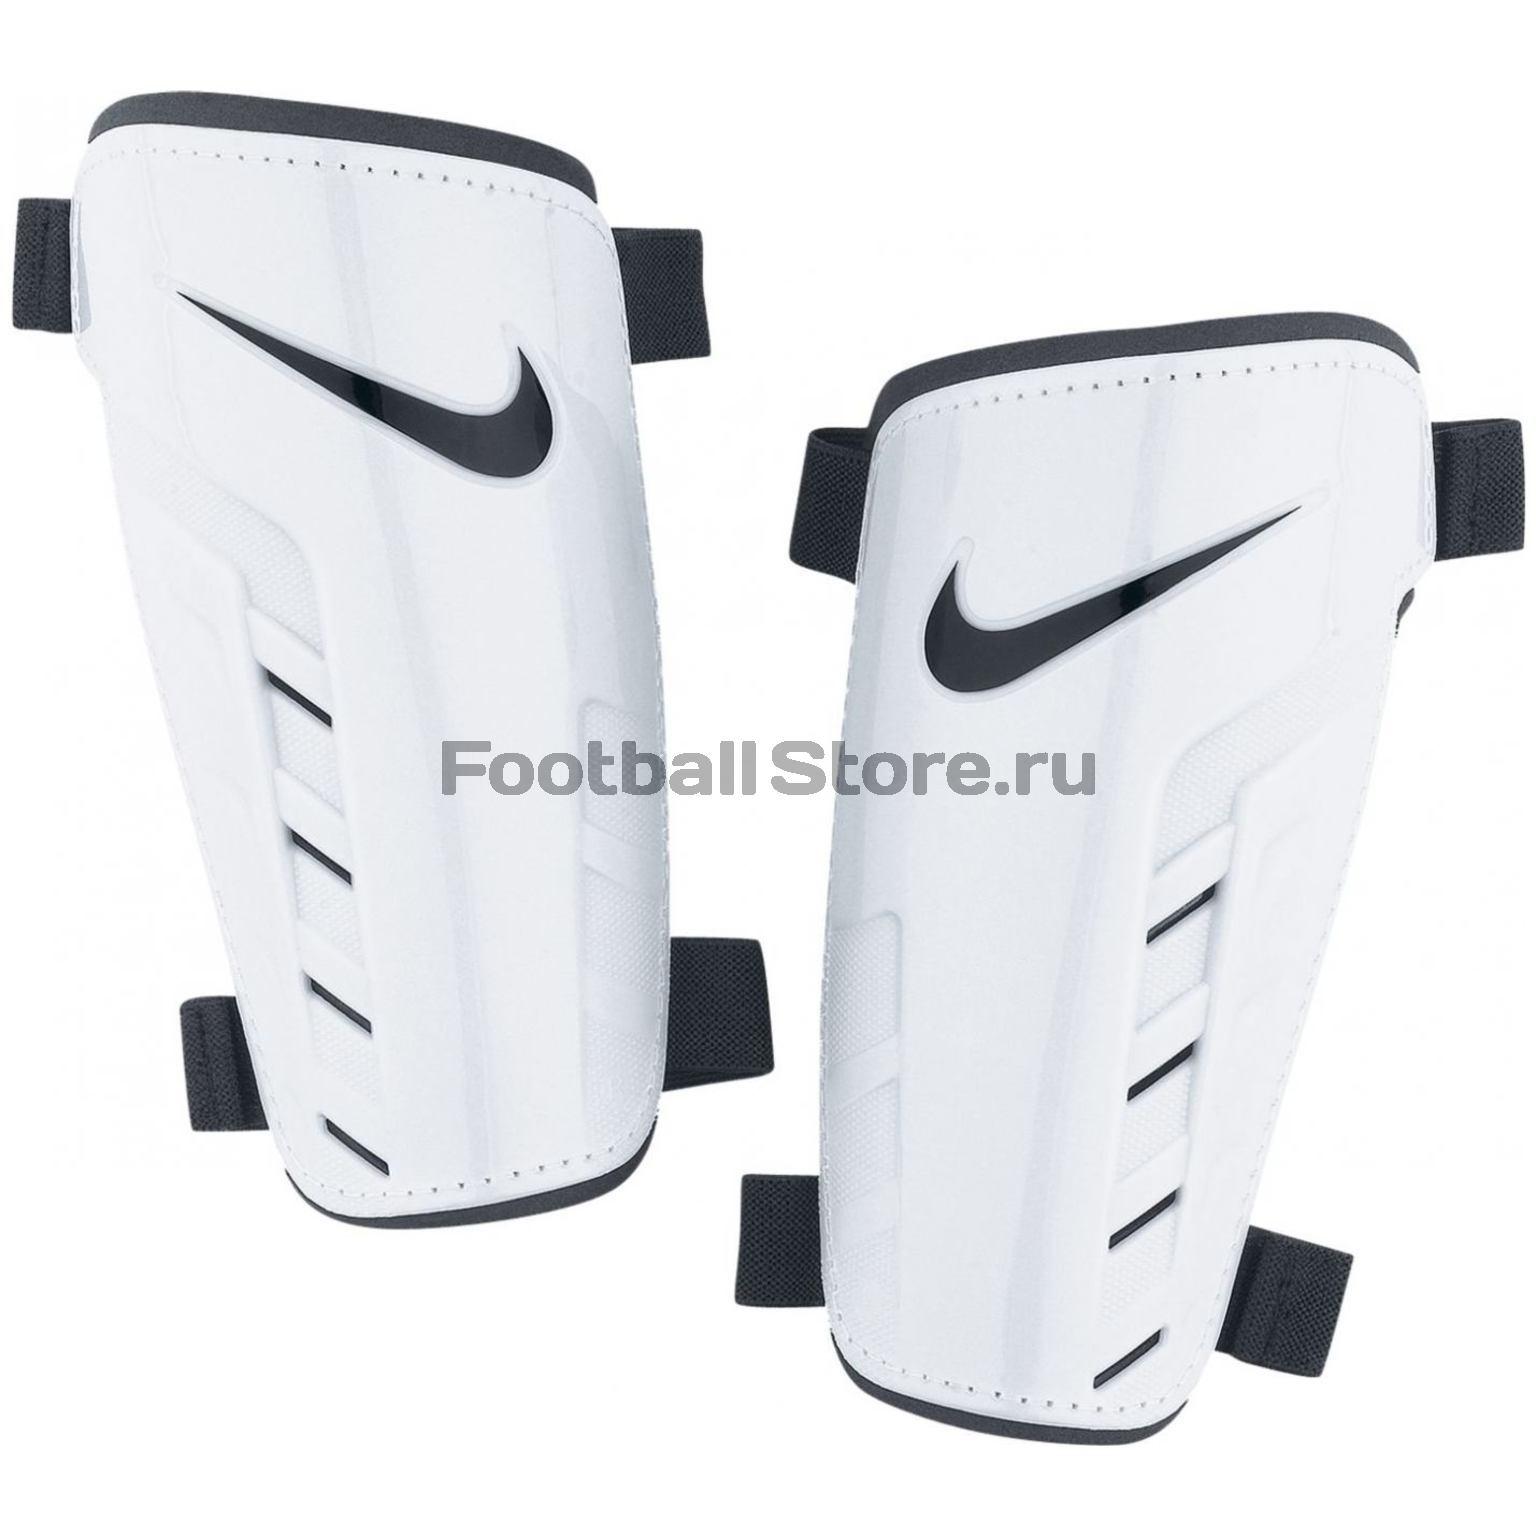 Защита ног Nike Щитки Nike Park guard